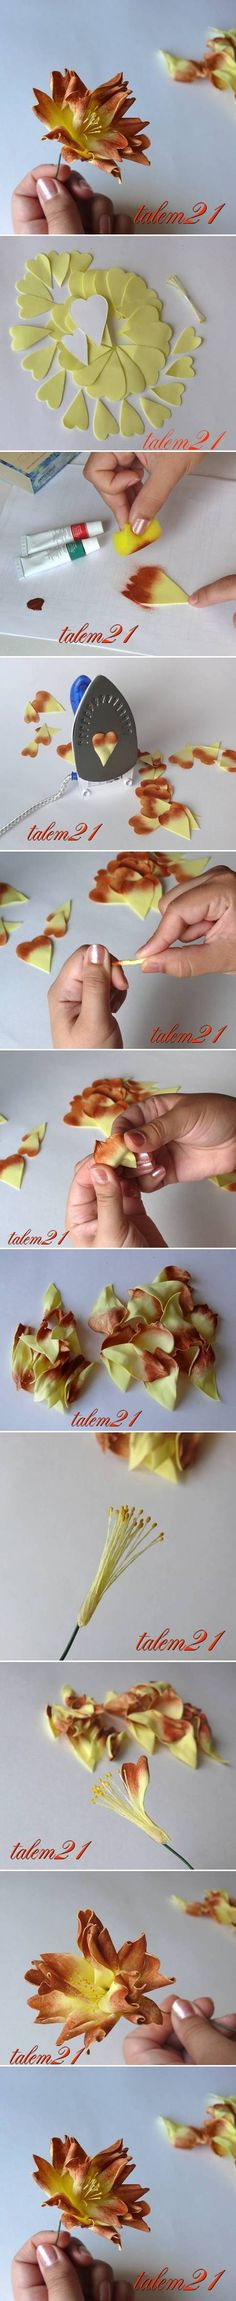 DIY Fantasy Flower DIY Projects | UsefulDIY.com Follow Us on Facebook ==> http://www.facebook.com/UsefulDiy